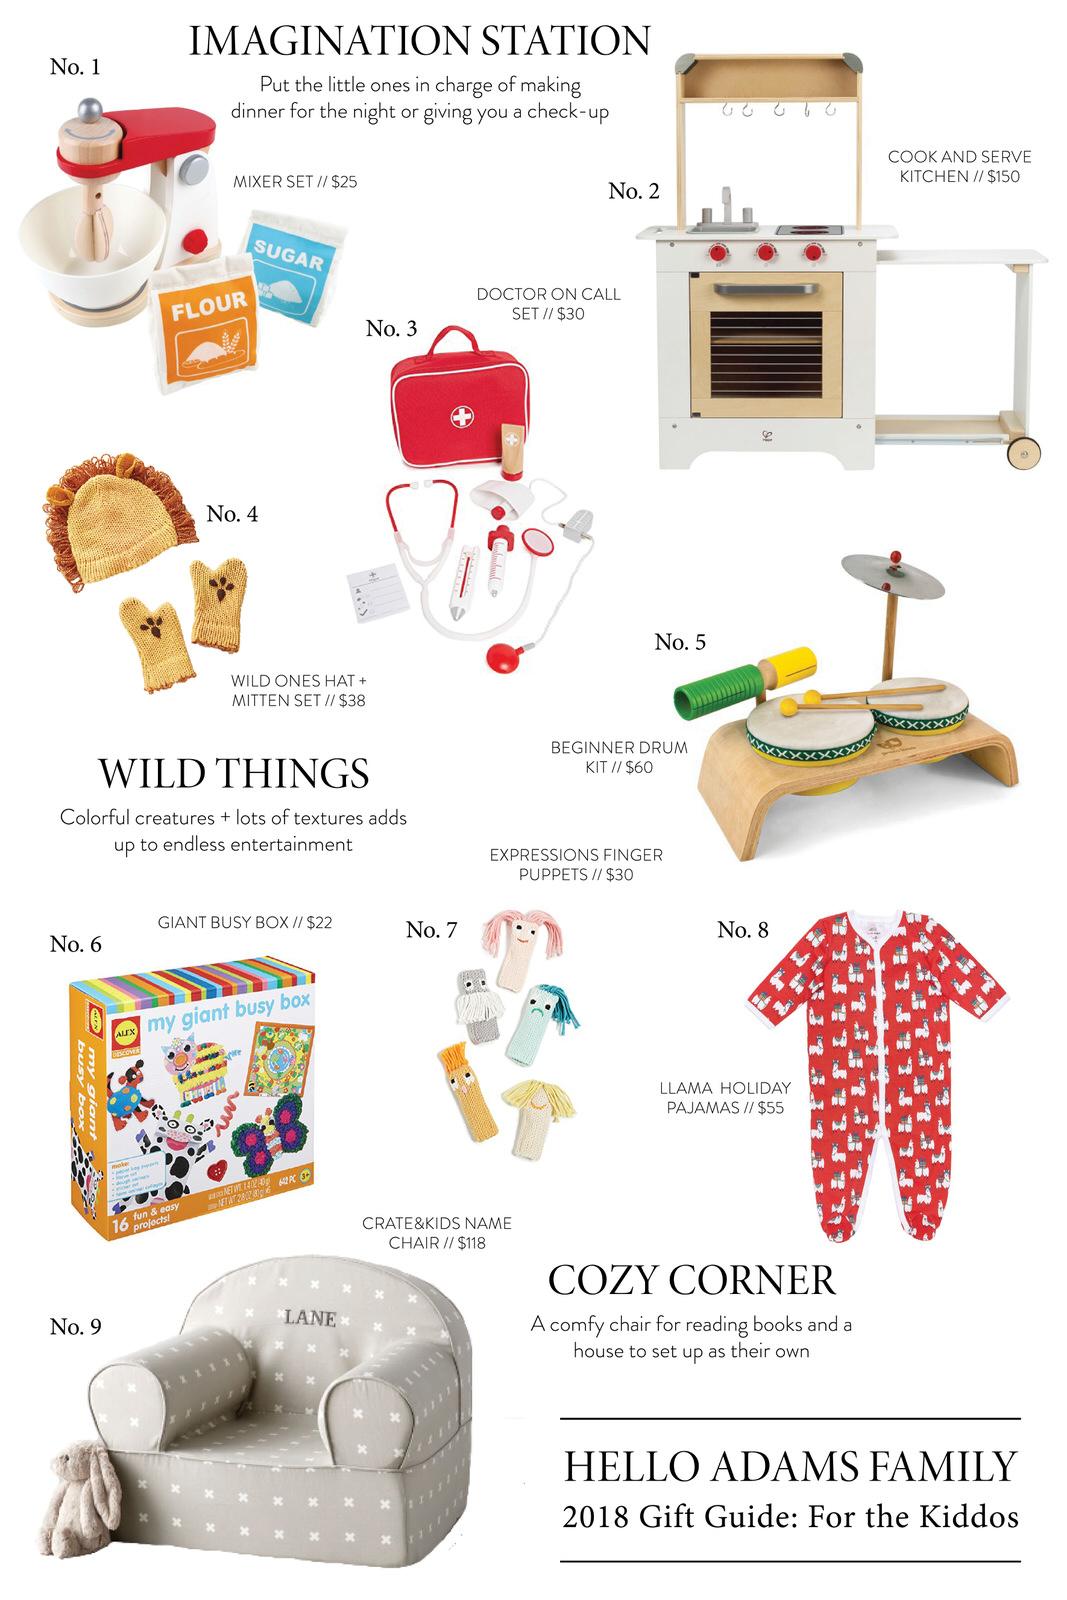 Gift Guide: For Kiddos